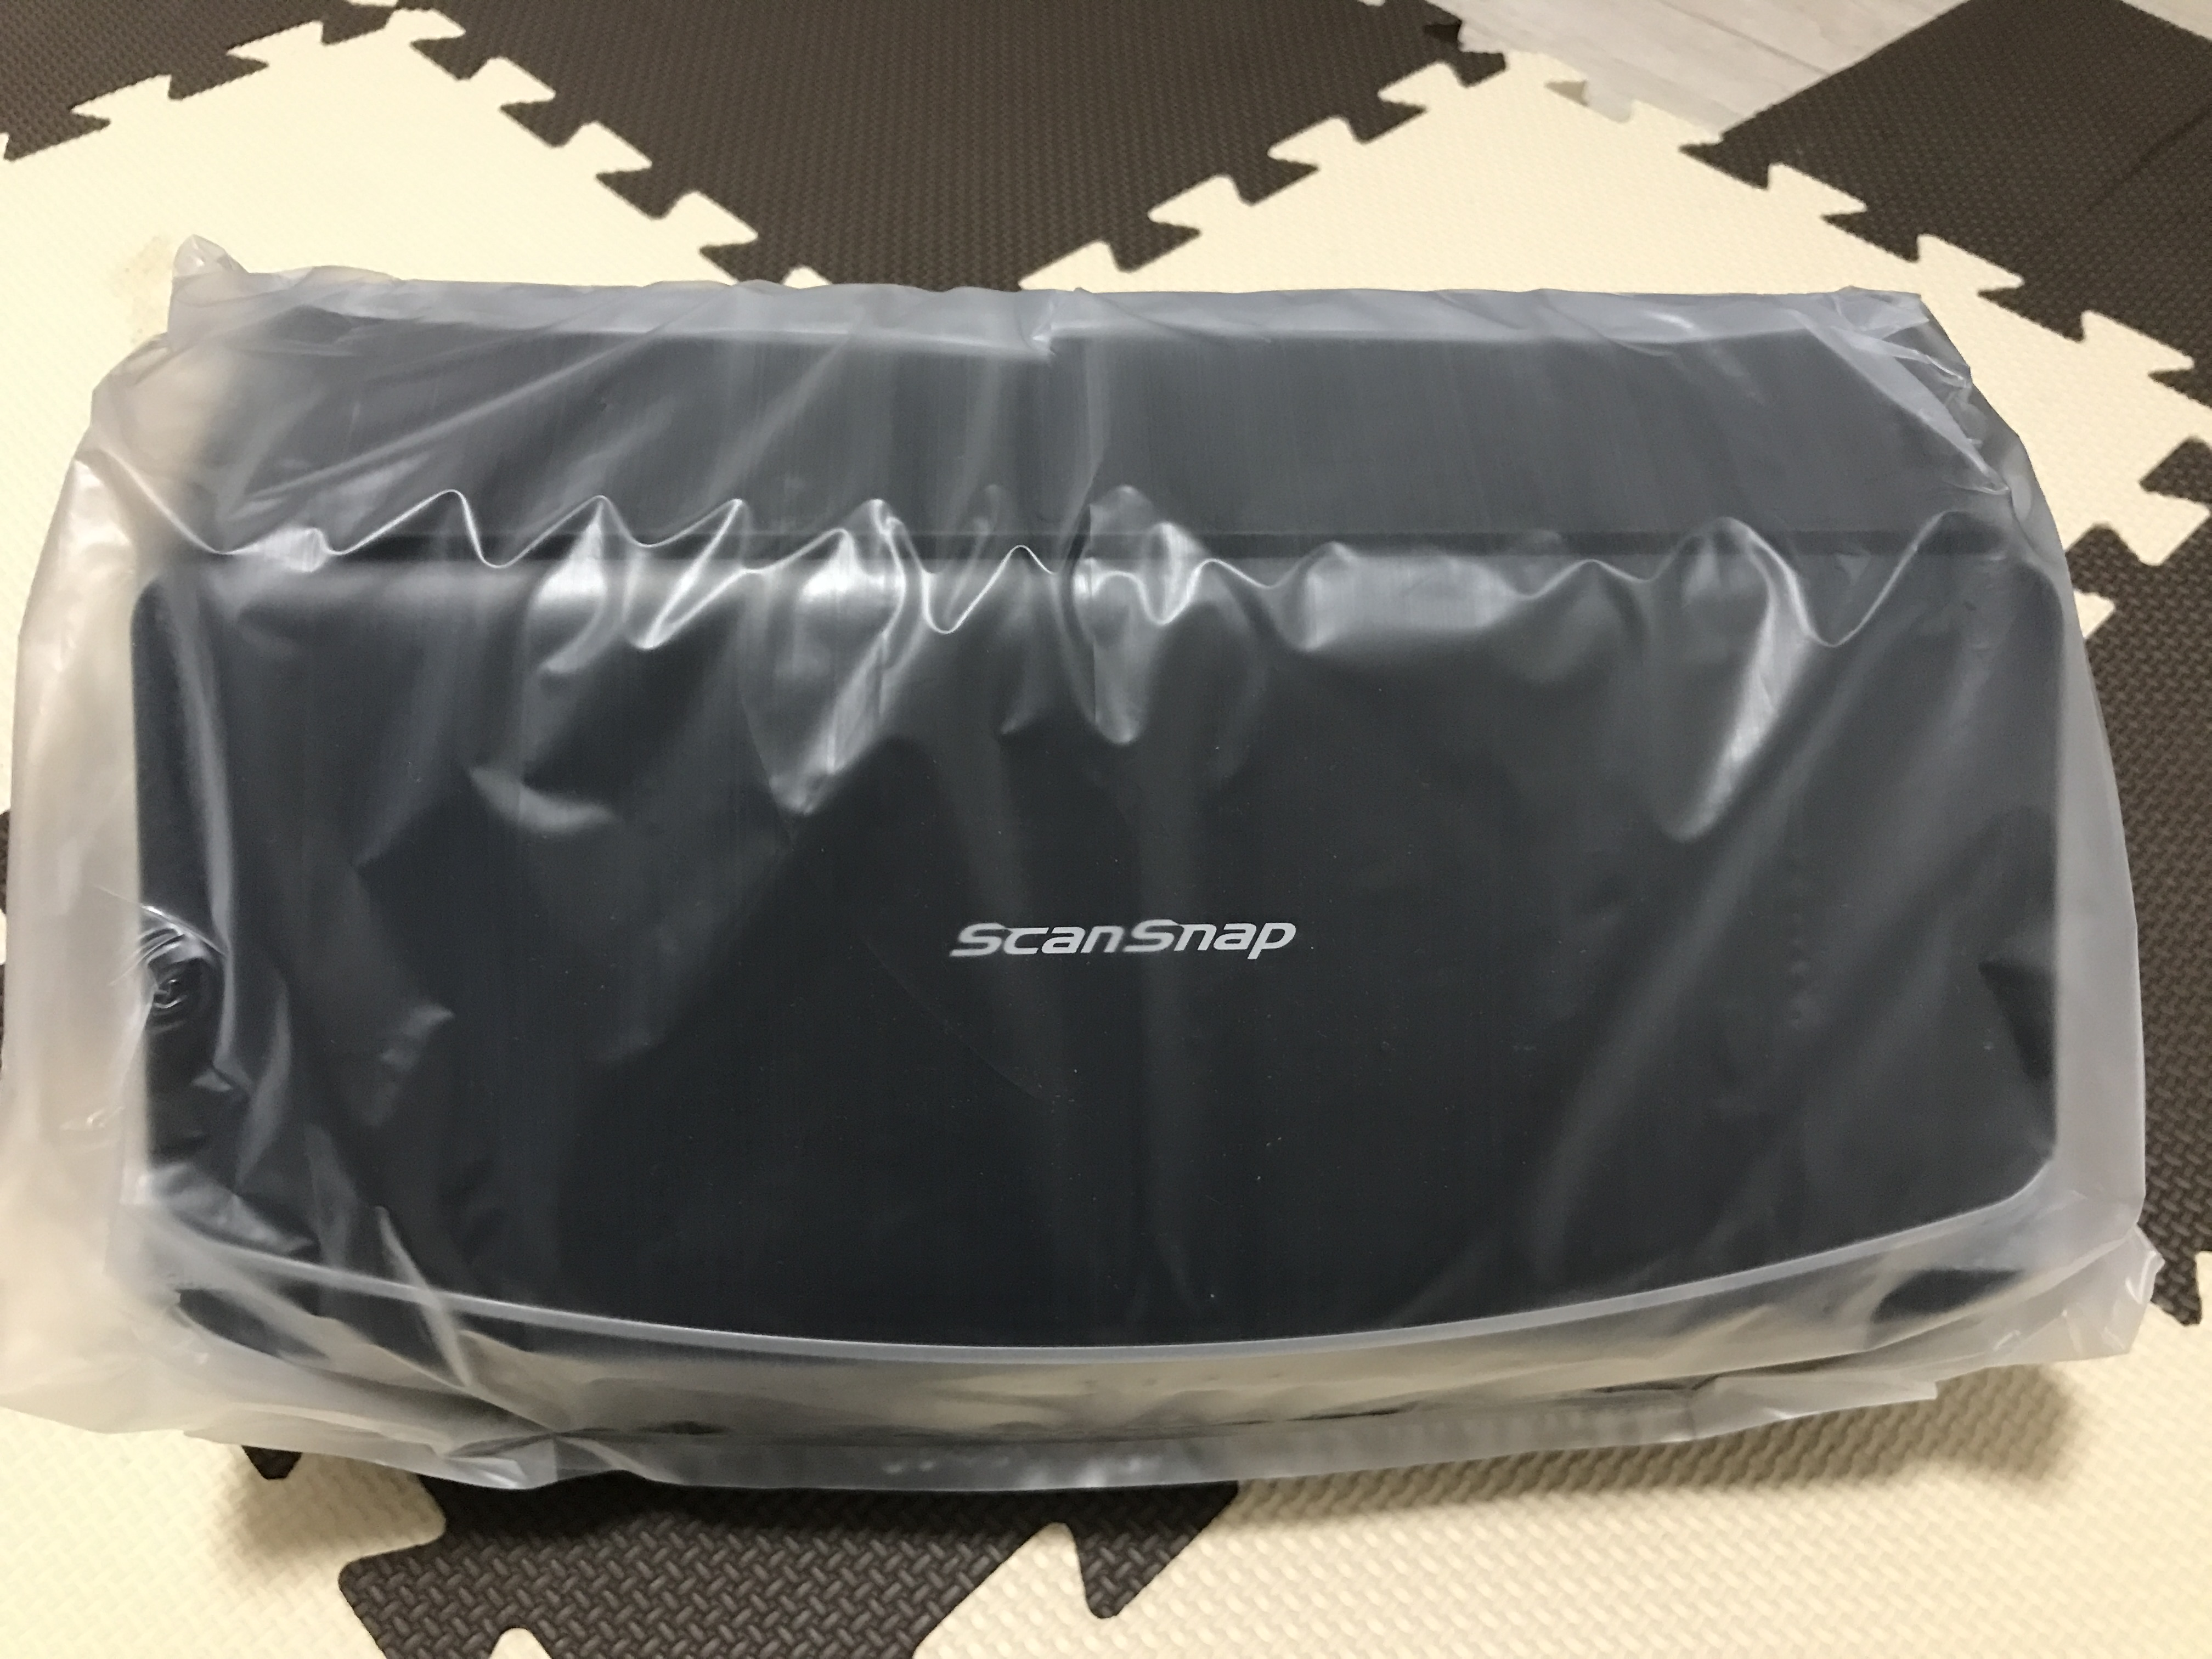 ScanSnap iX 1500 3